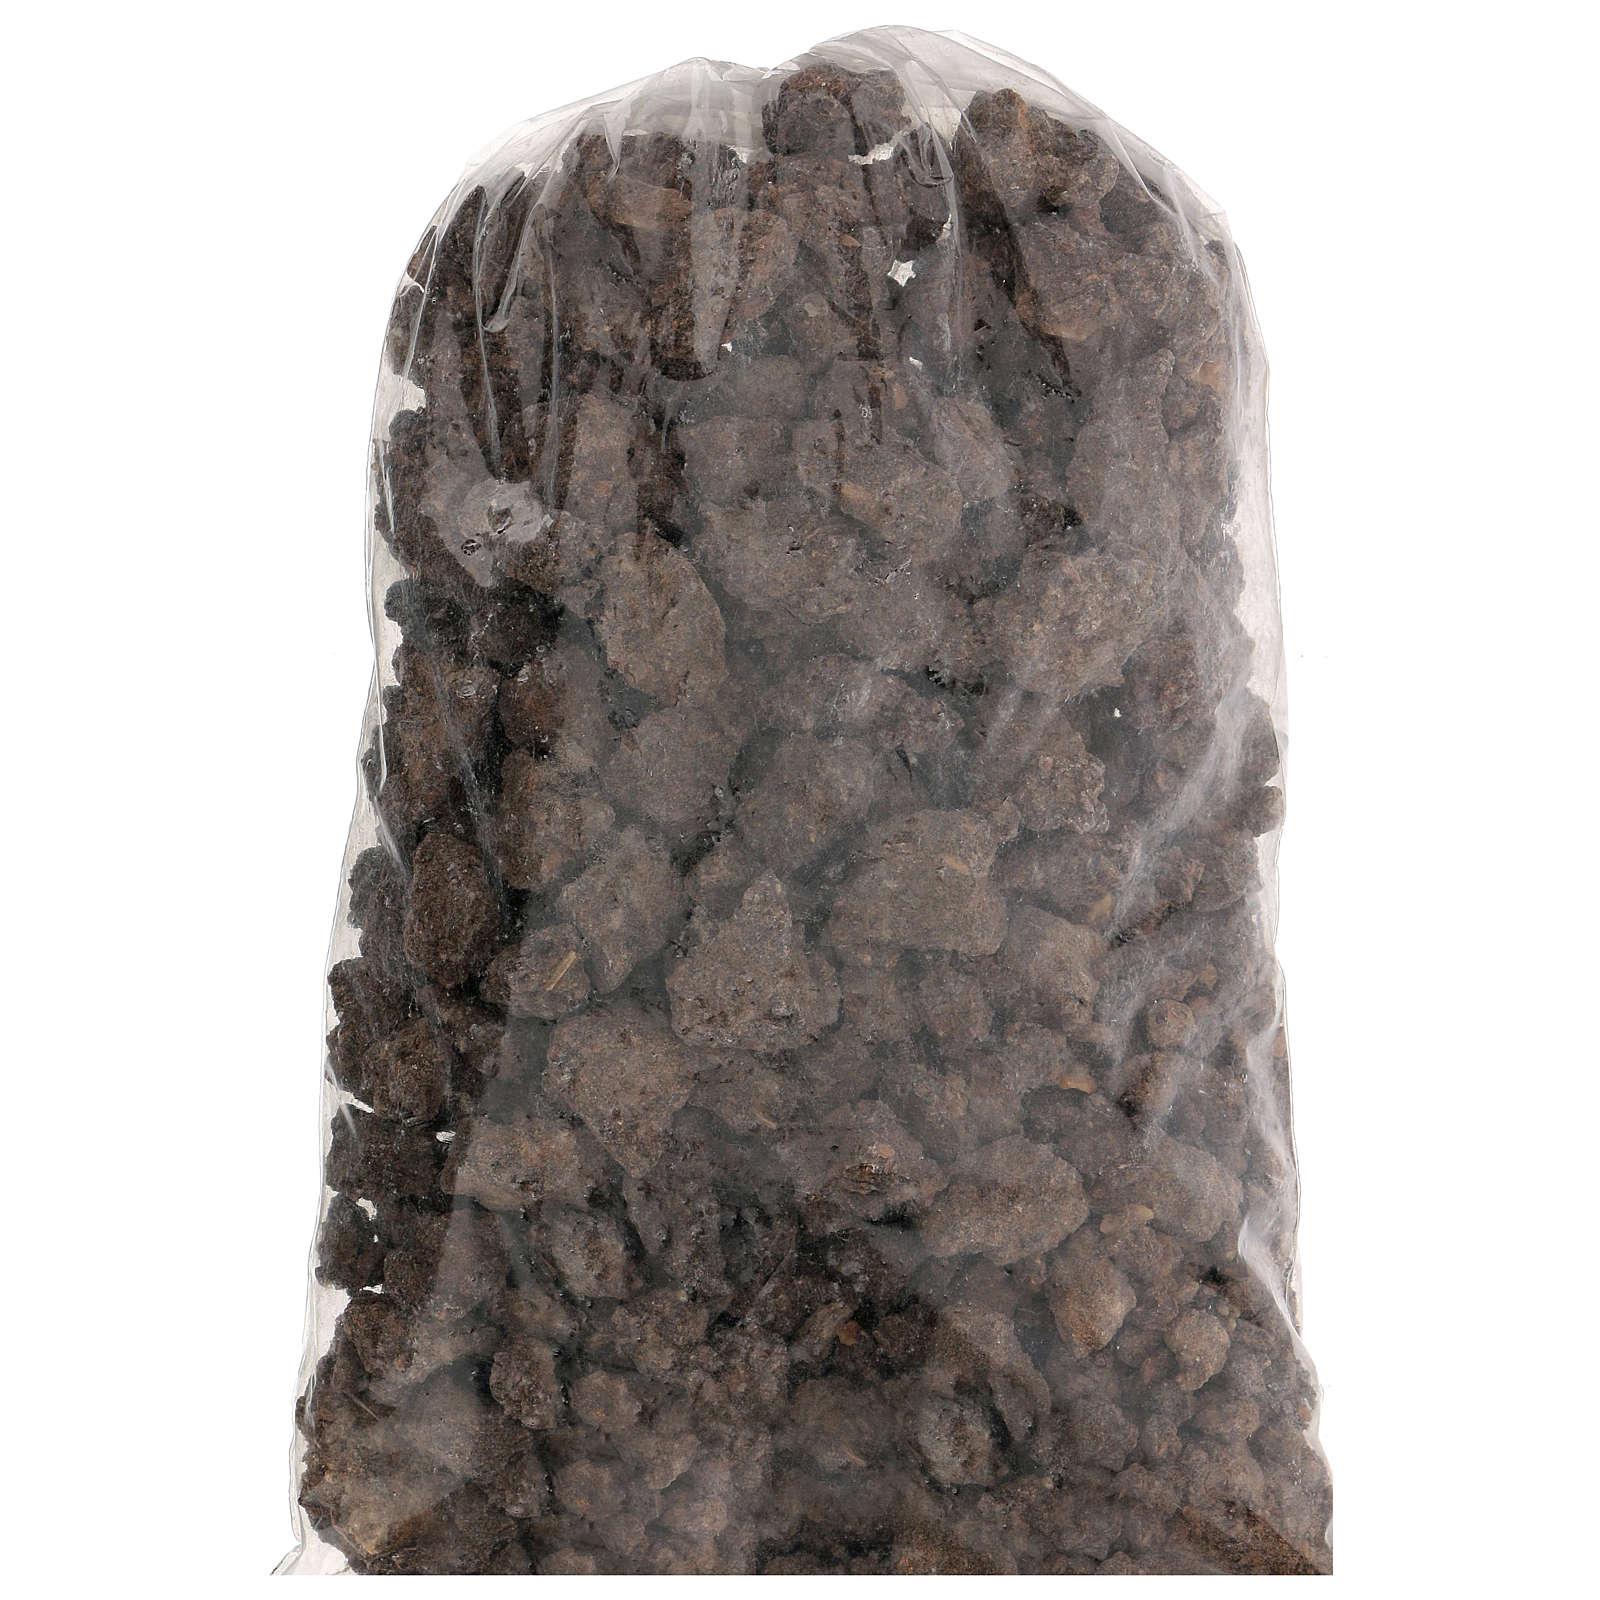 Benzoin Black incenso 1 kg 3